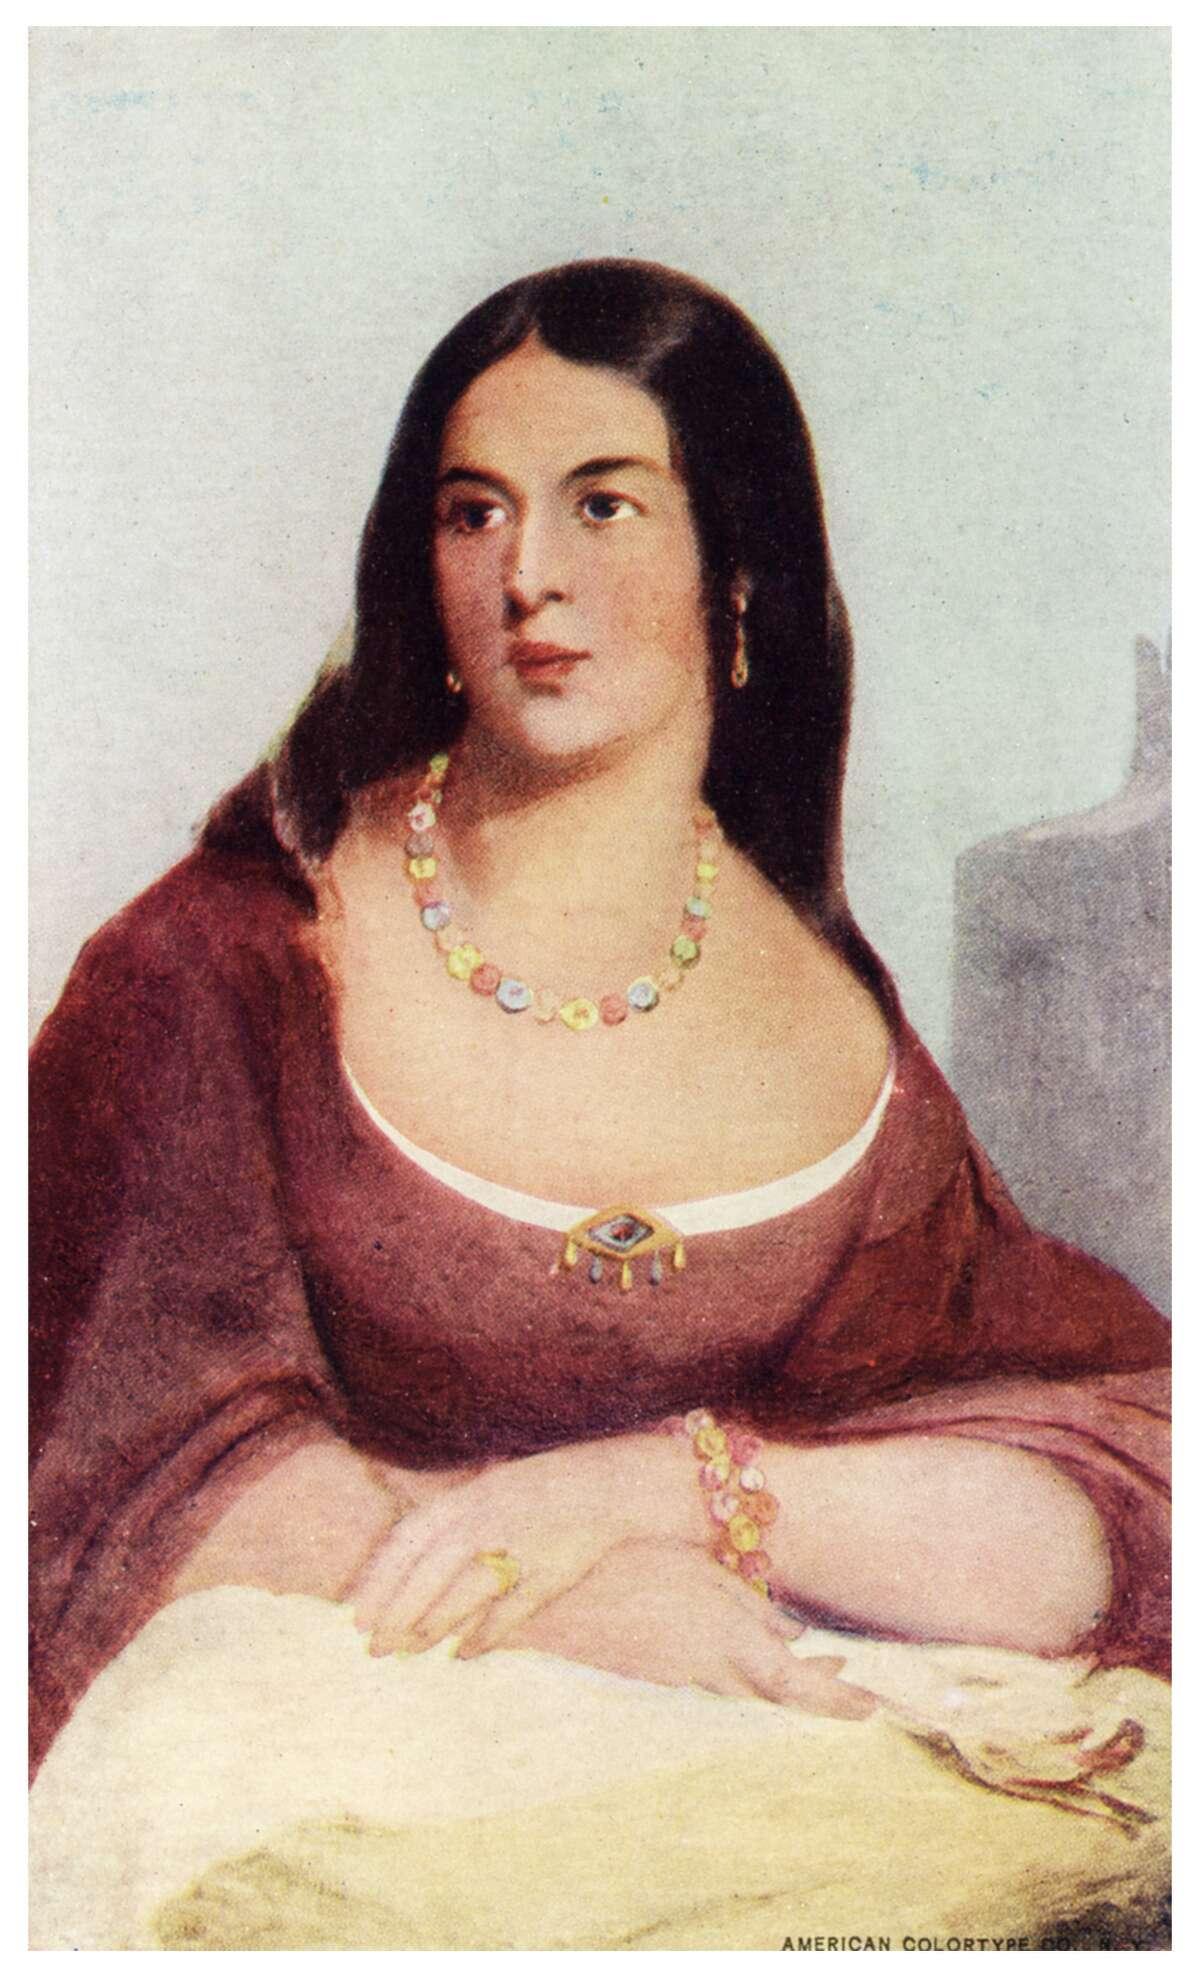 POCAHONTAS (Real life) Shown is a portrait of Matoaka, aka Pocahontas, aka Rebecca Rolfe.